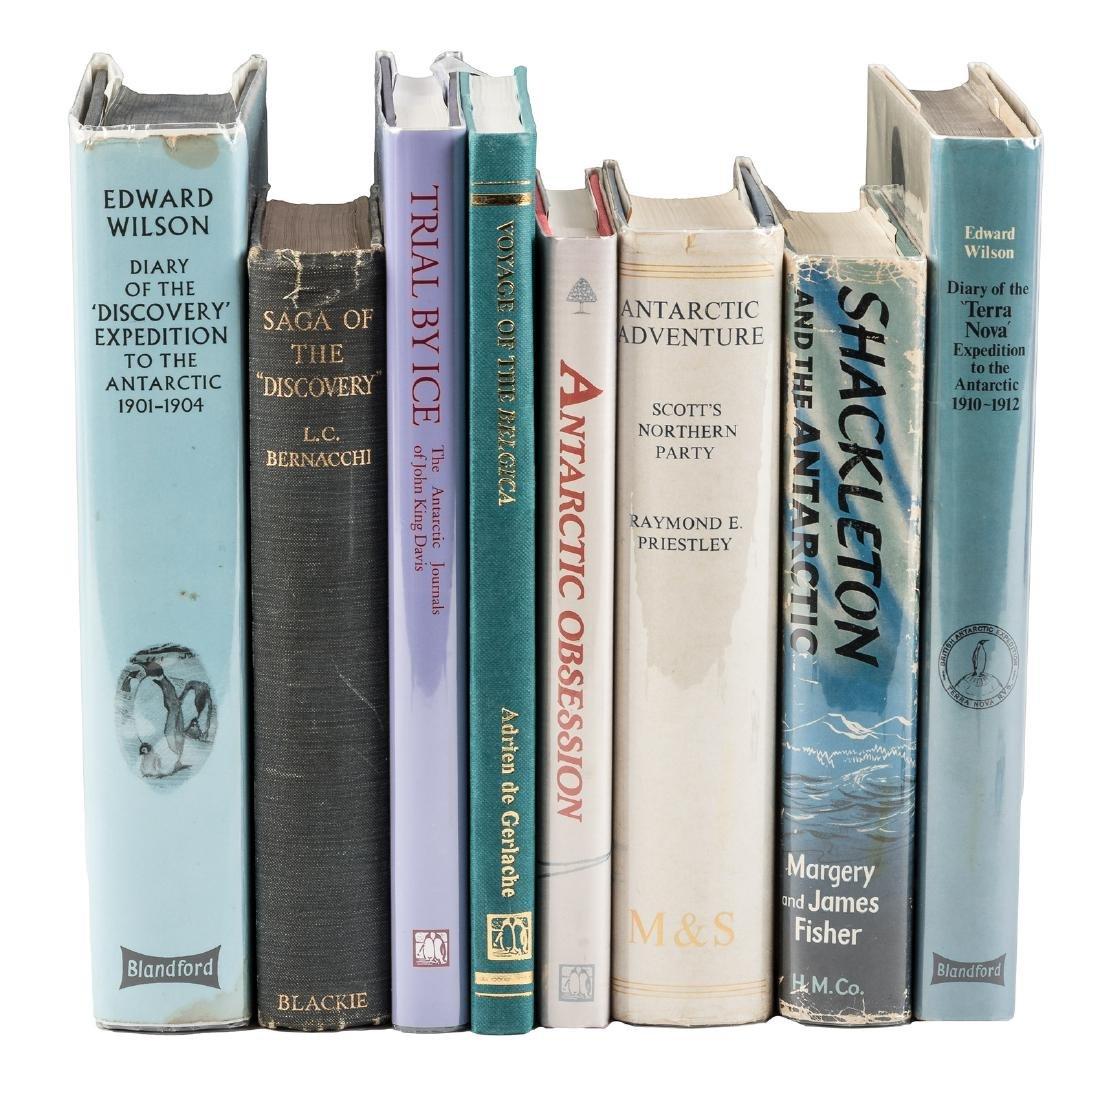 Eight volumes on Antarctic exploration